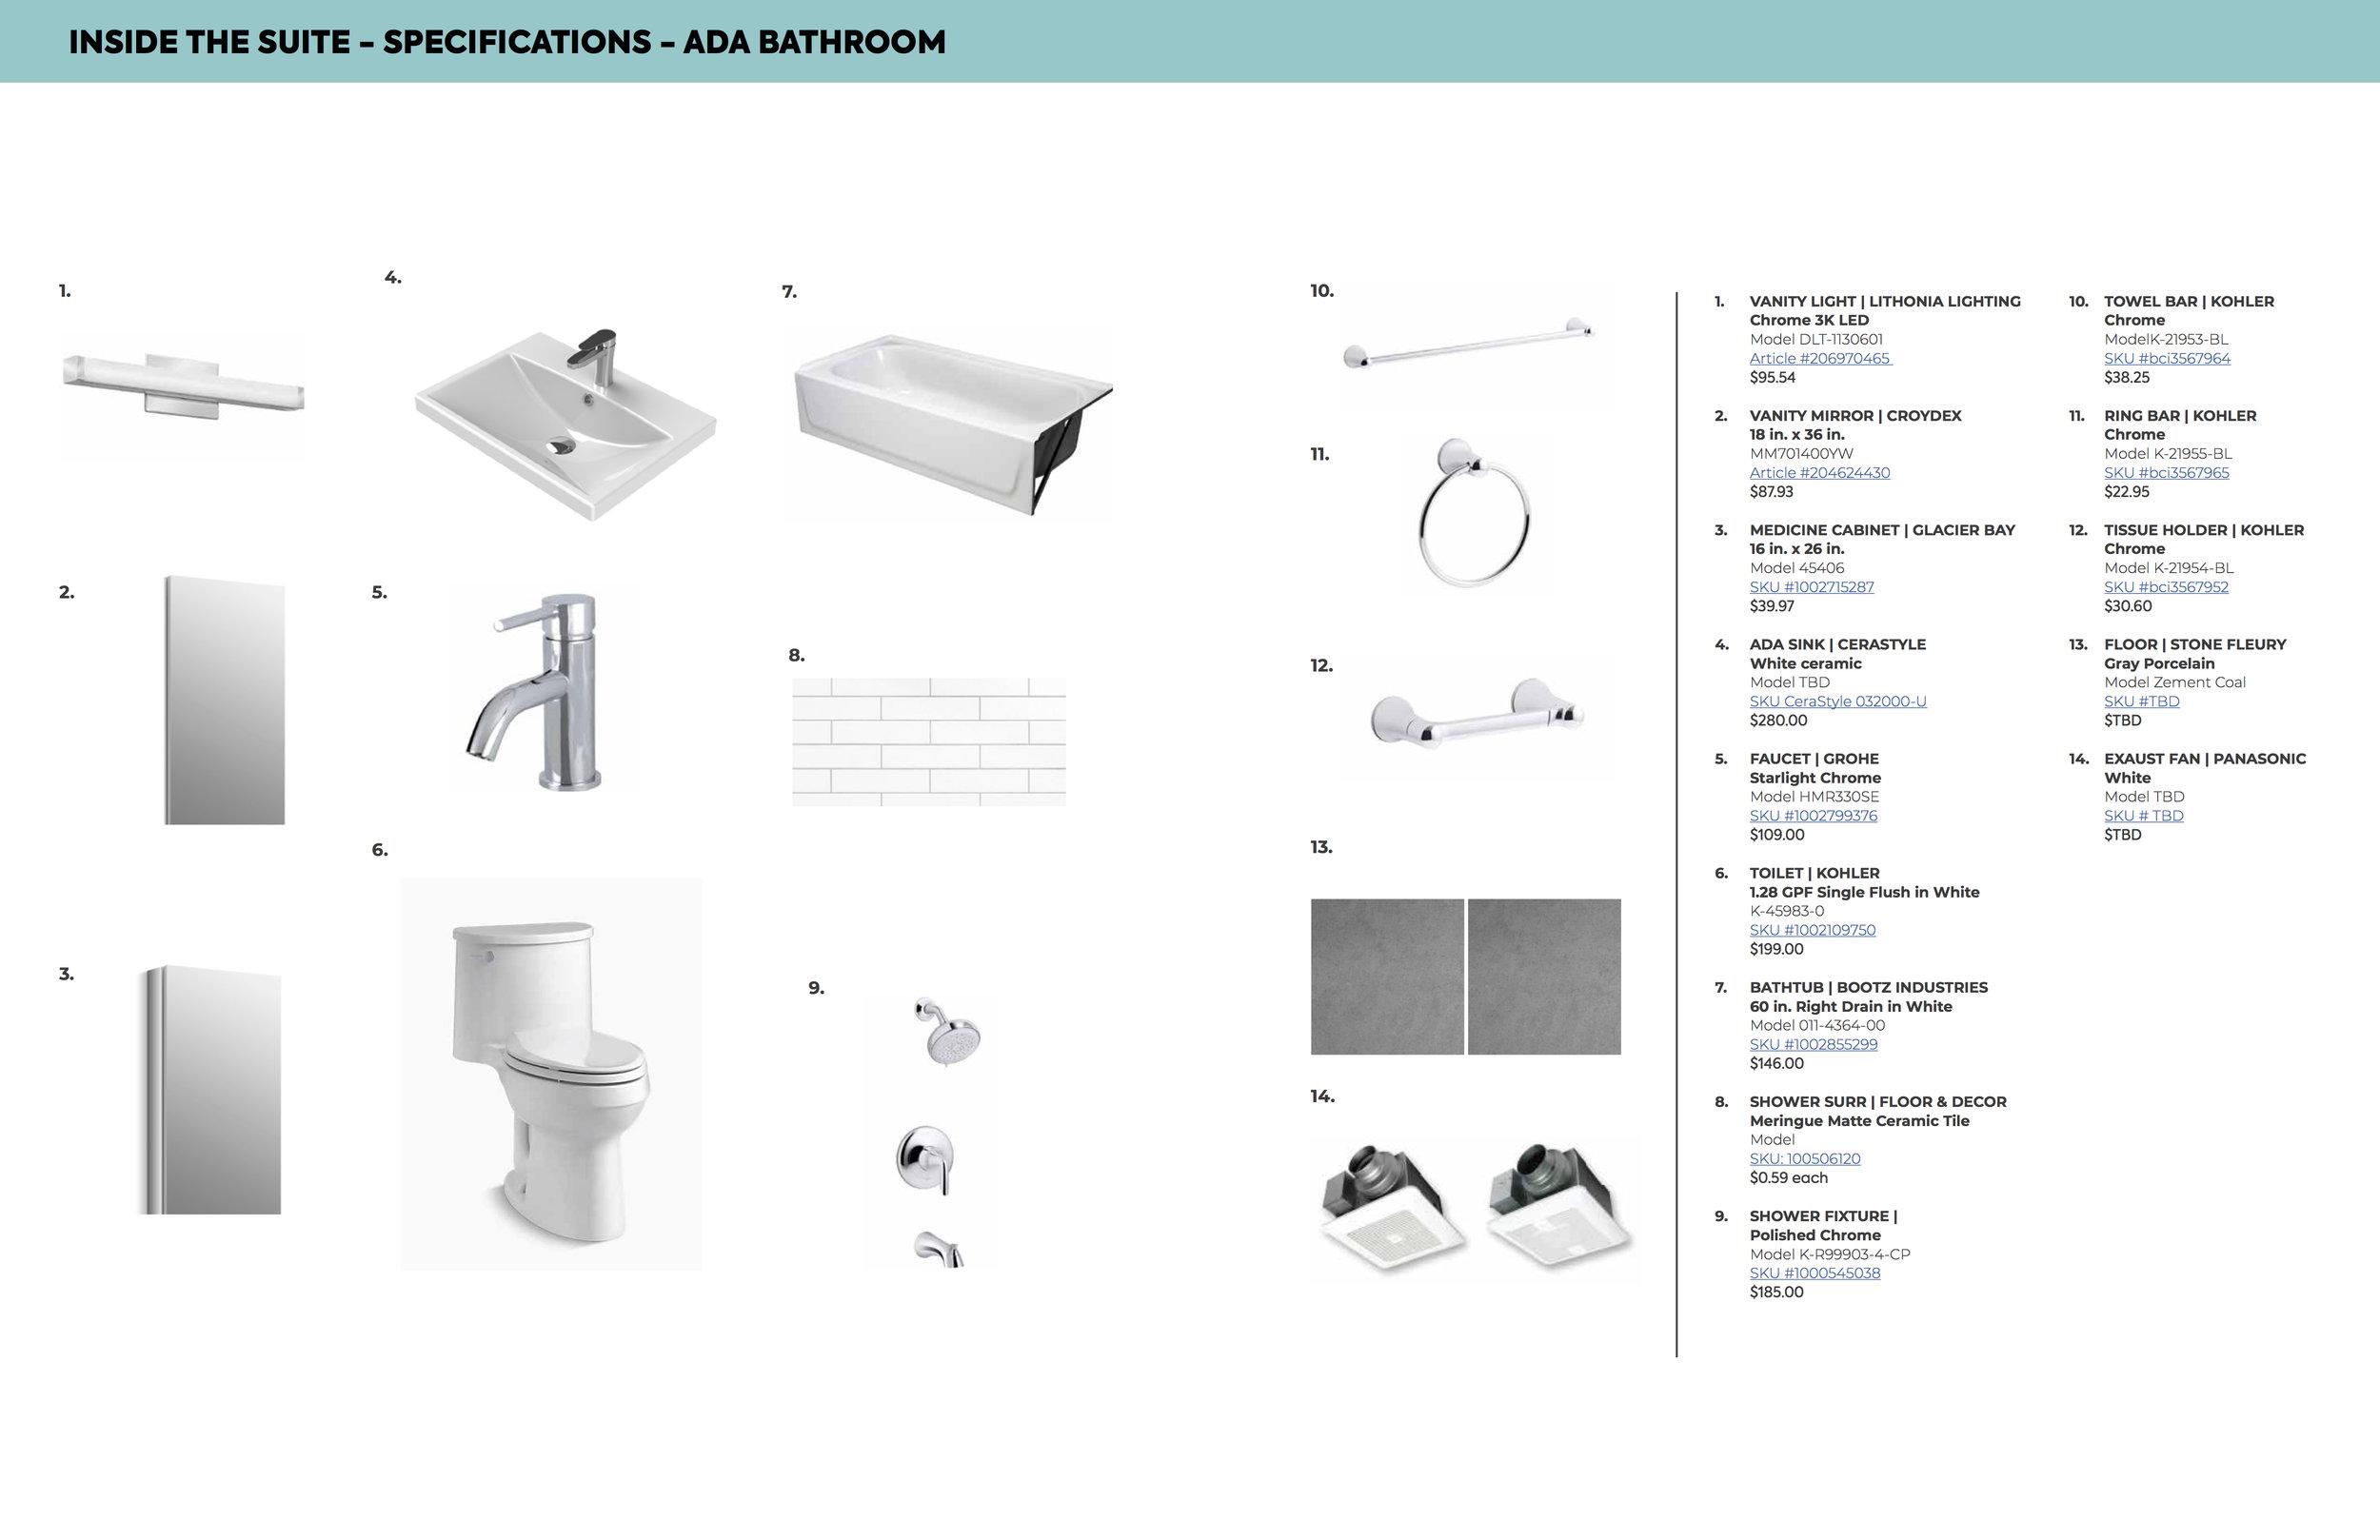 ABD Product Book Manual - 20.jpg